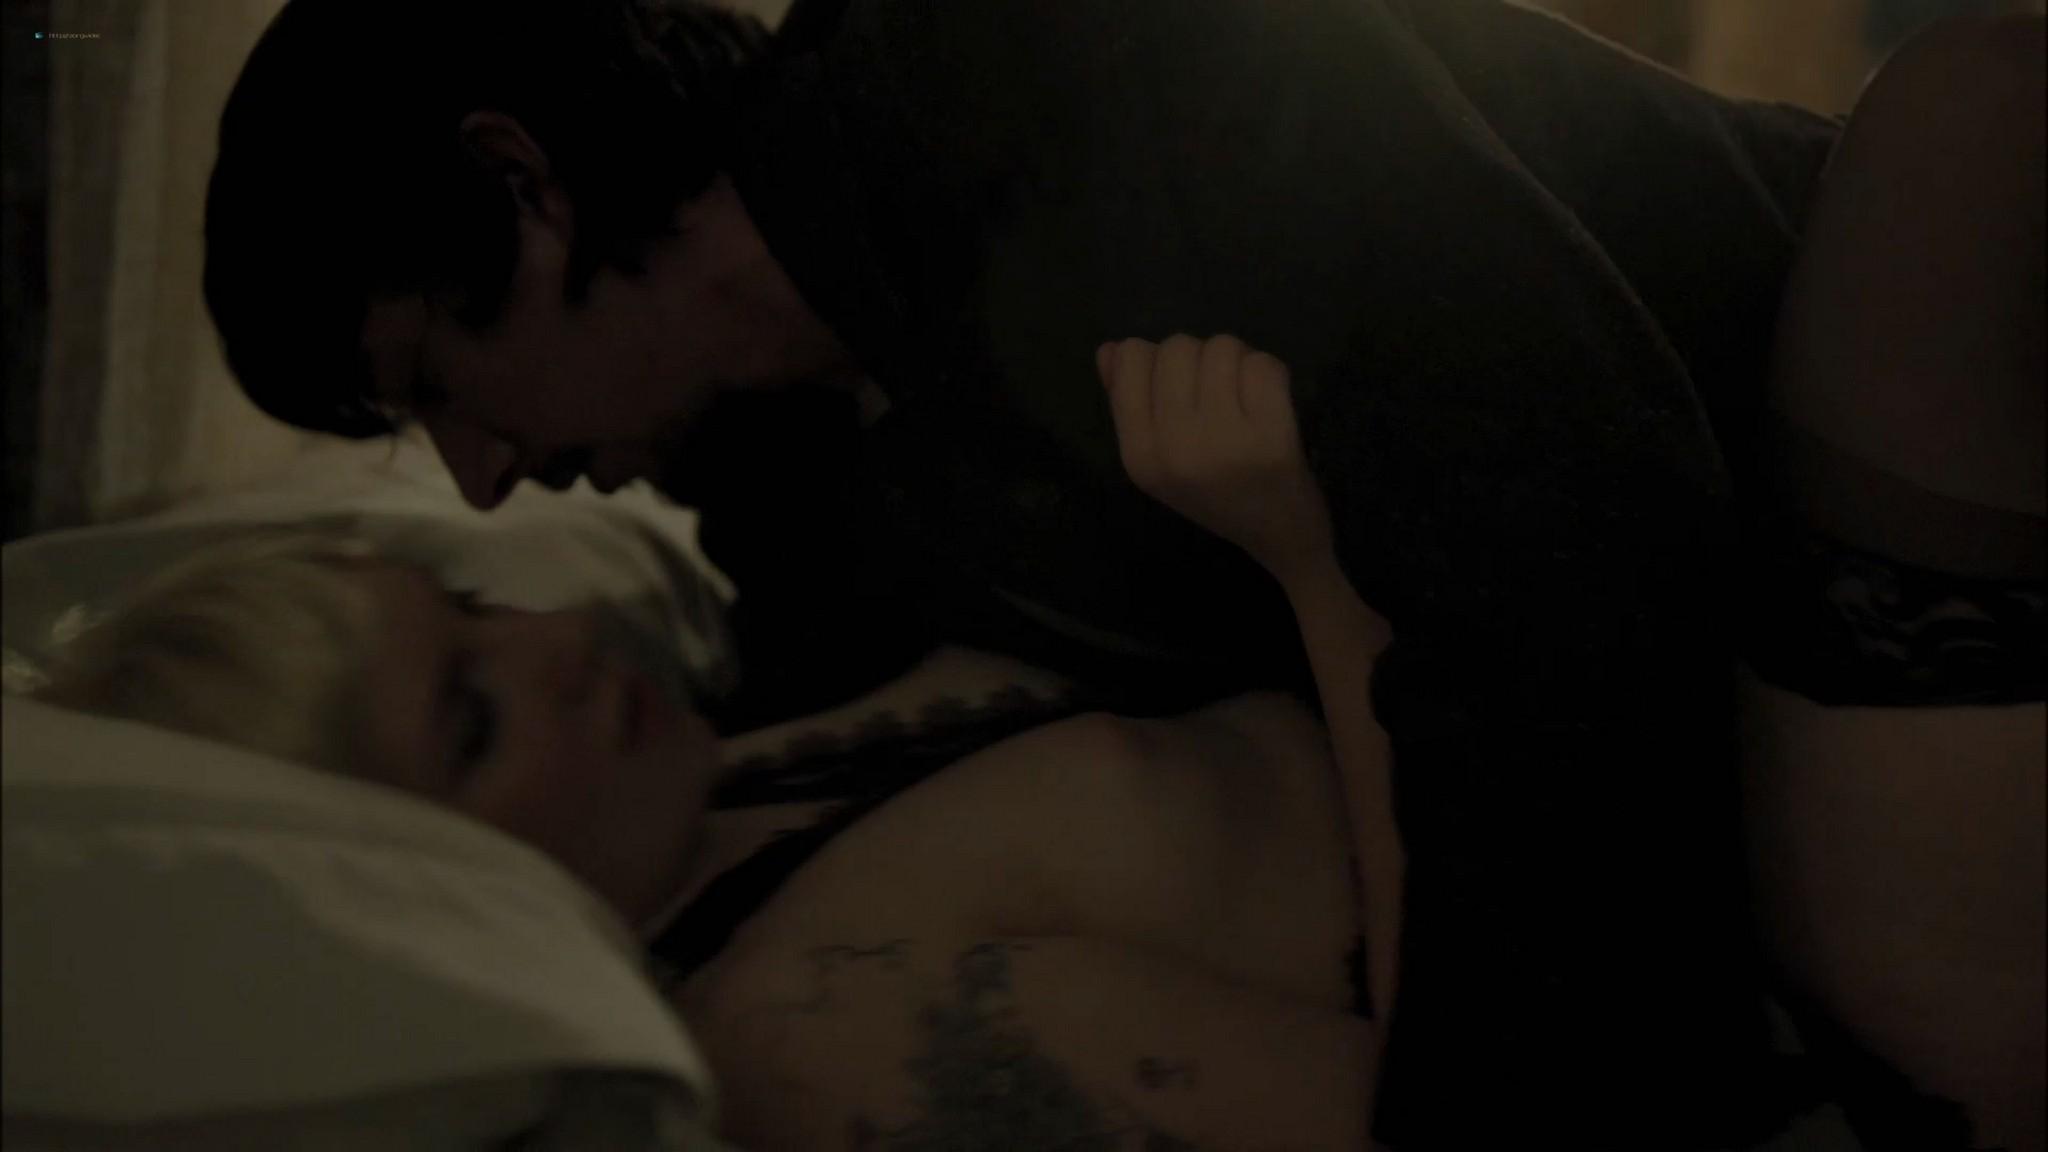 Allison Williams hot sex Lena Dunham naked Zosia Mamet sex doggy style Girls 2012 s3e6 12 1080p Web 11